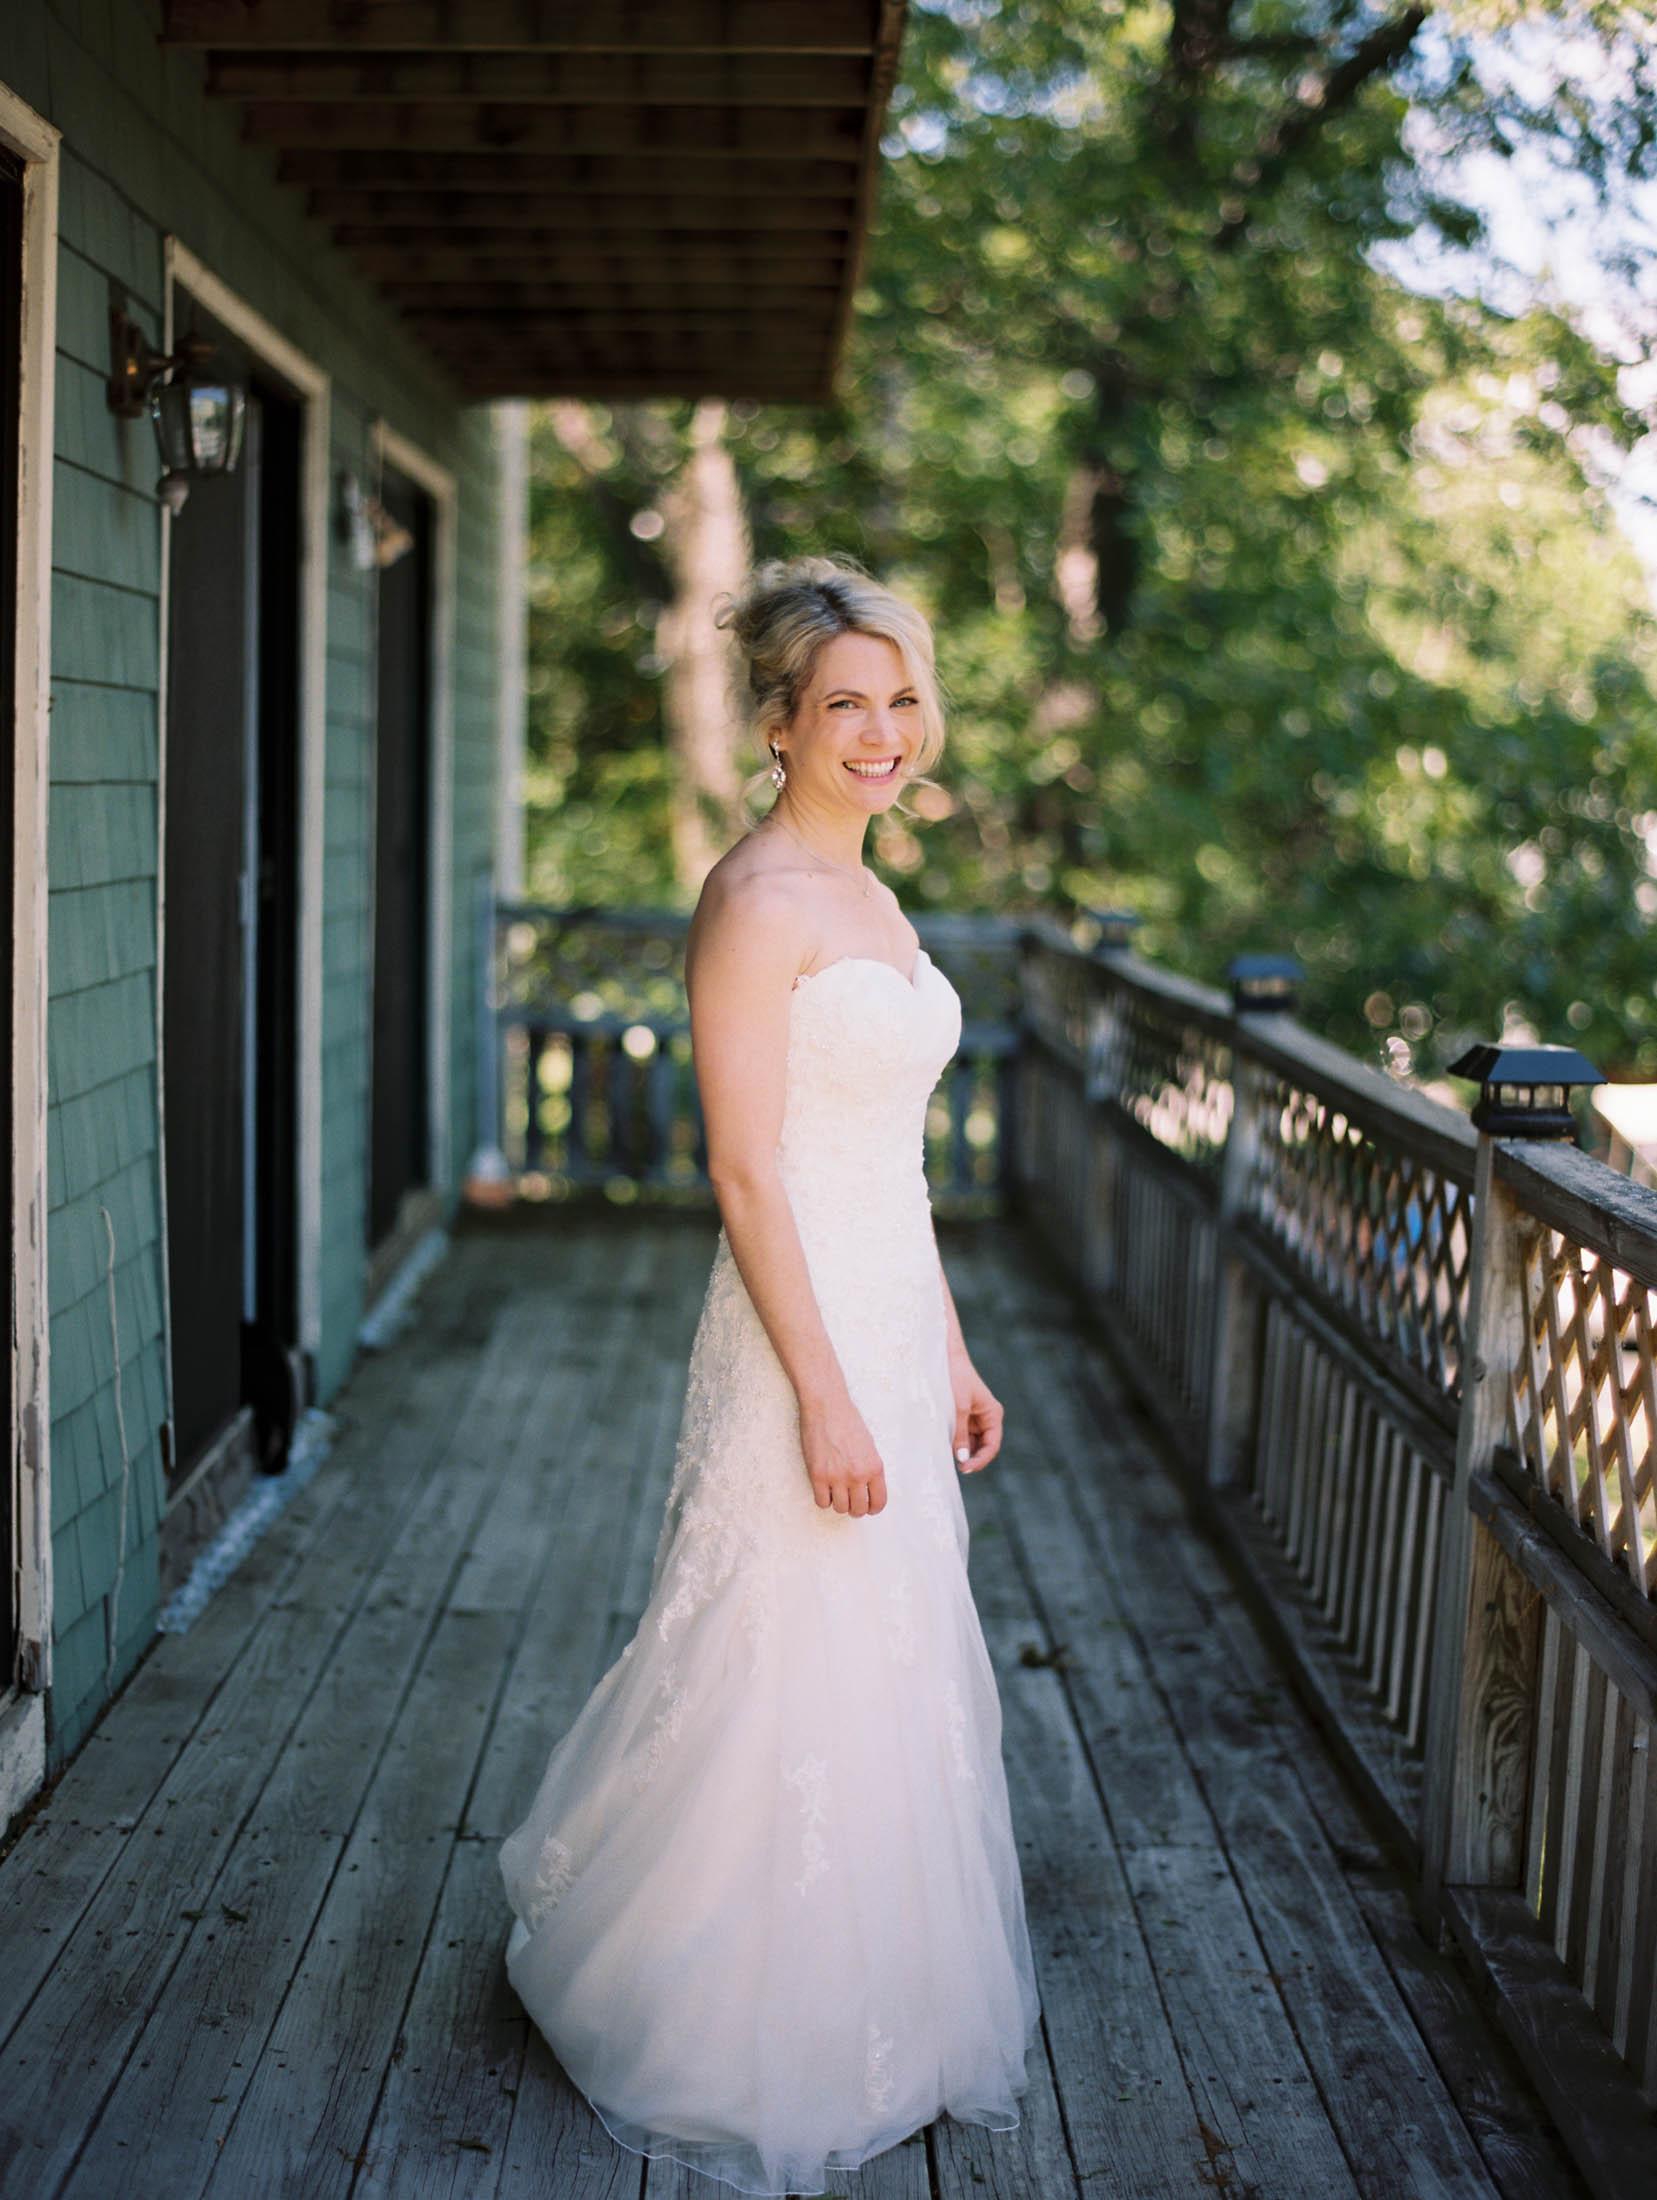 Blissful-Meadows-wedding-3.jpg